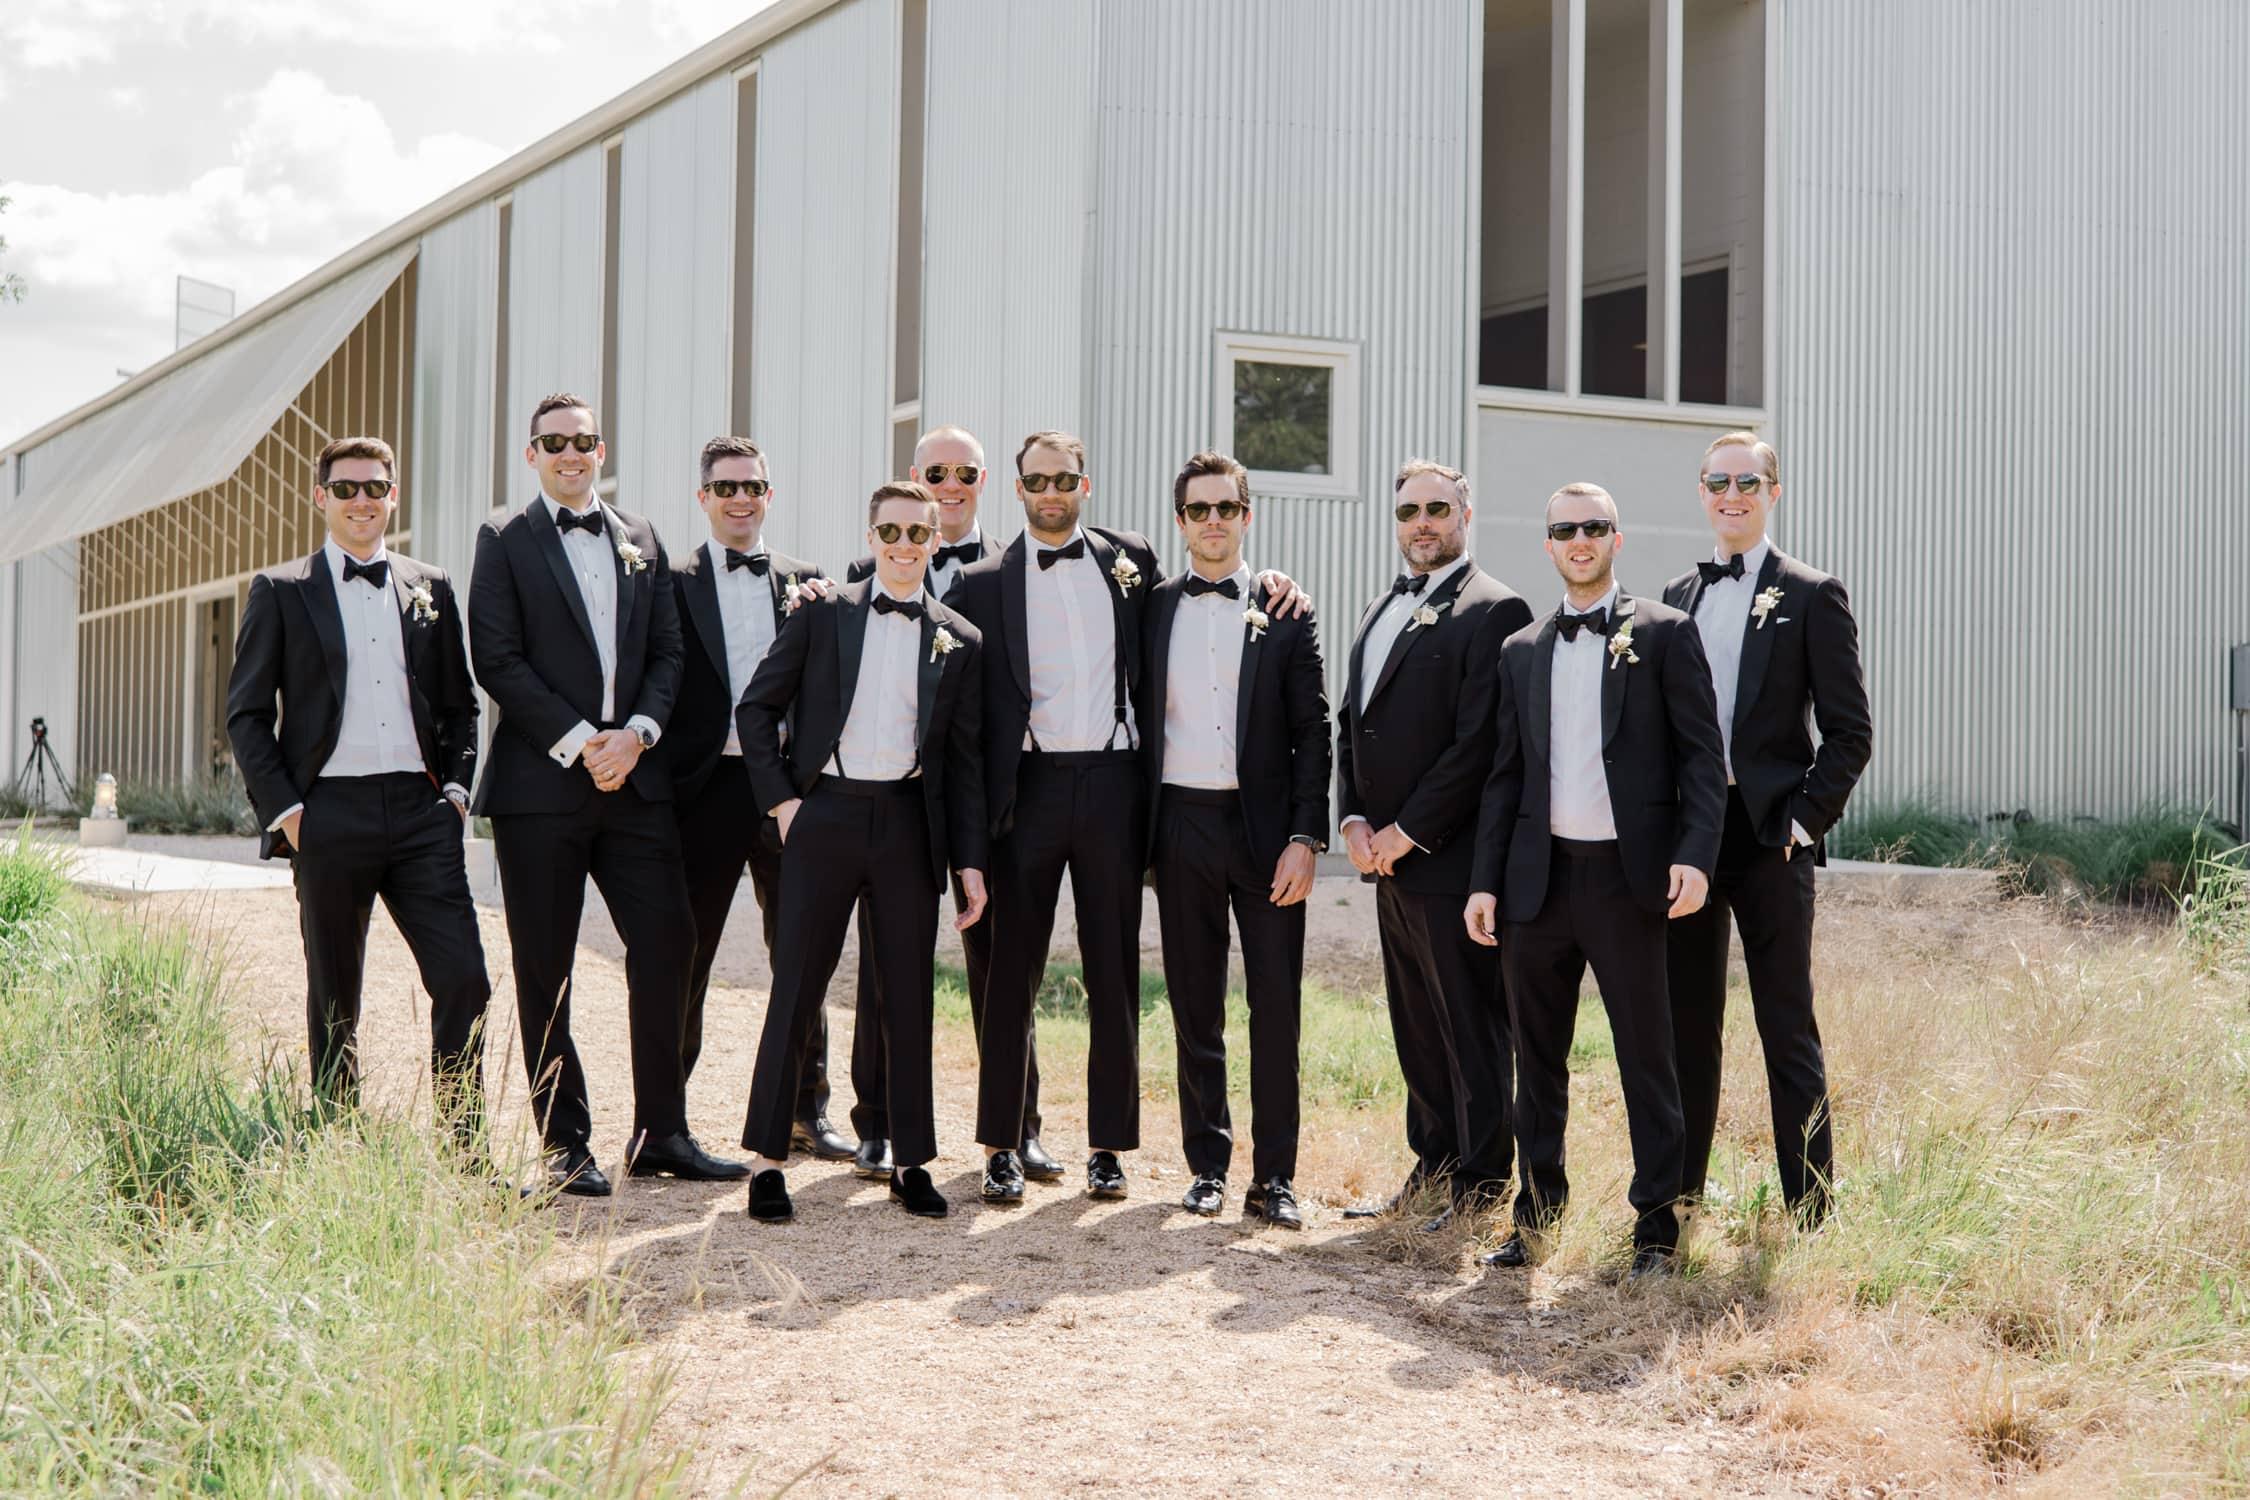 PROSPECT_HOUSE_WEDDING_AUSTIN_TX_MATTHEW_MOORE-00205.jpg